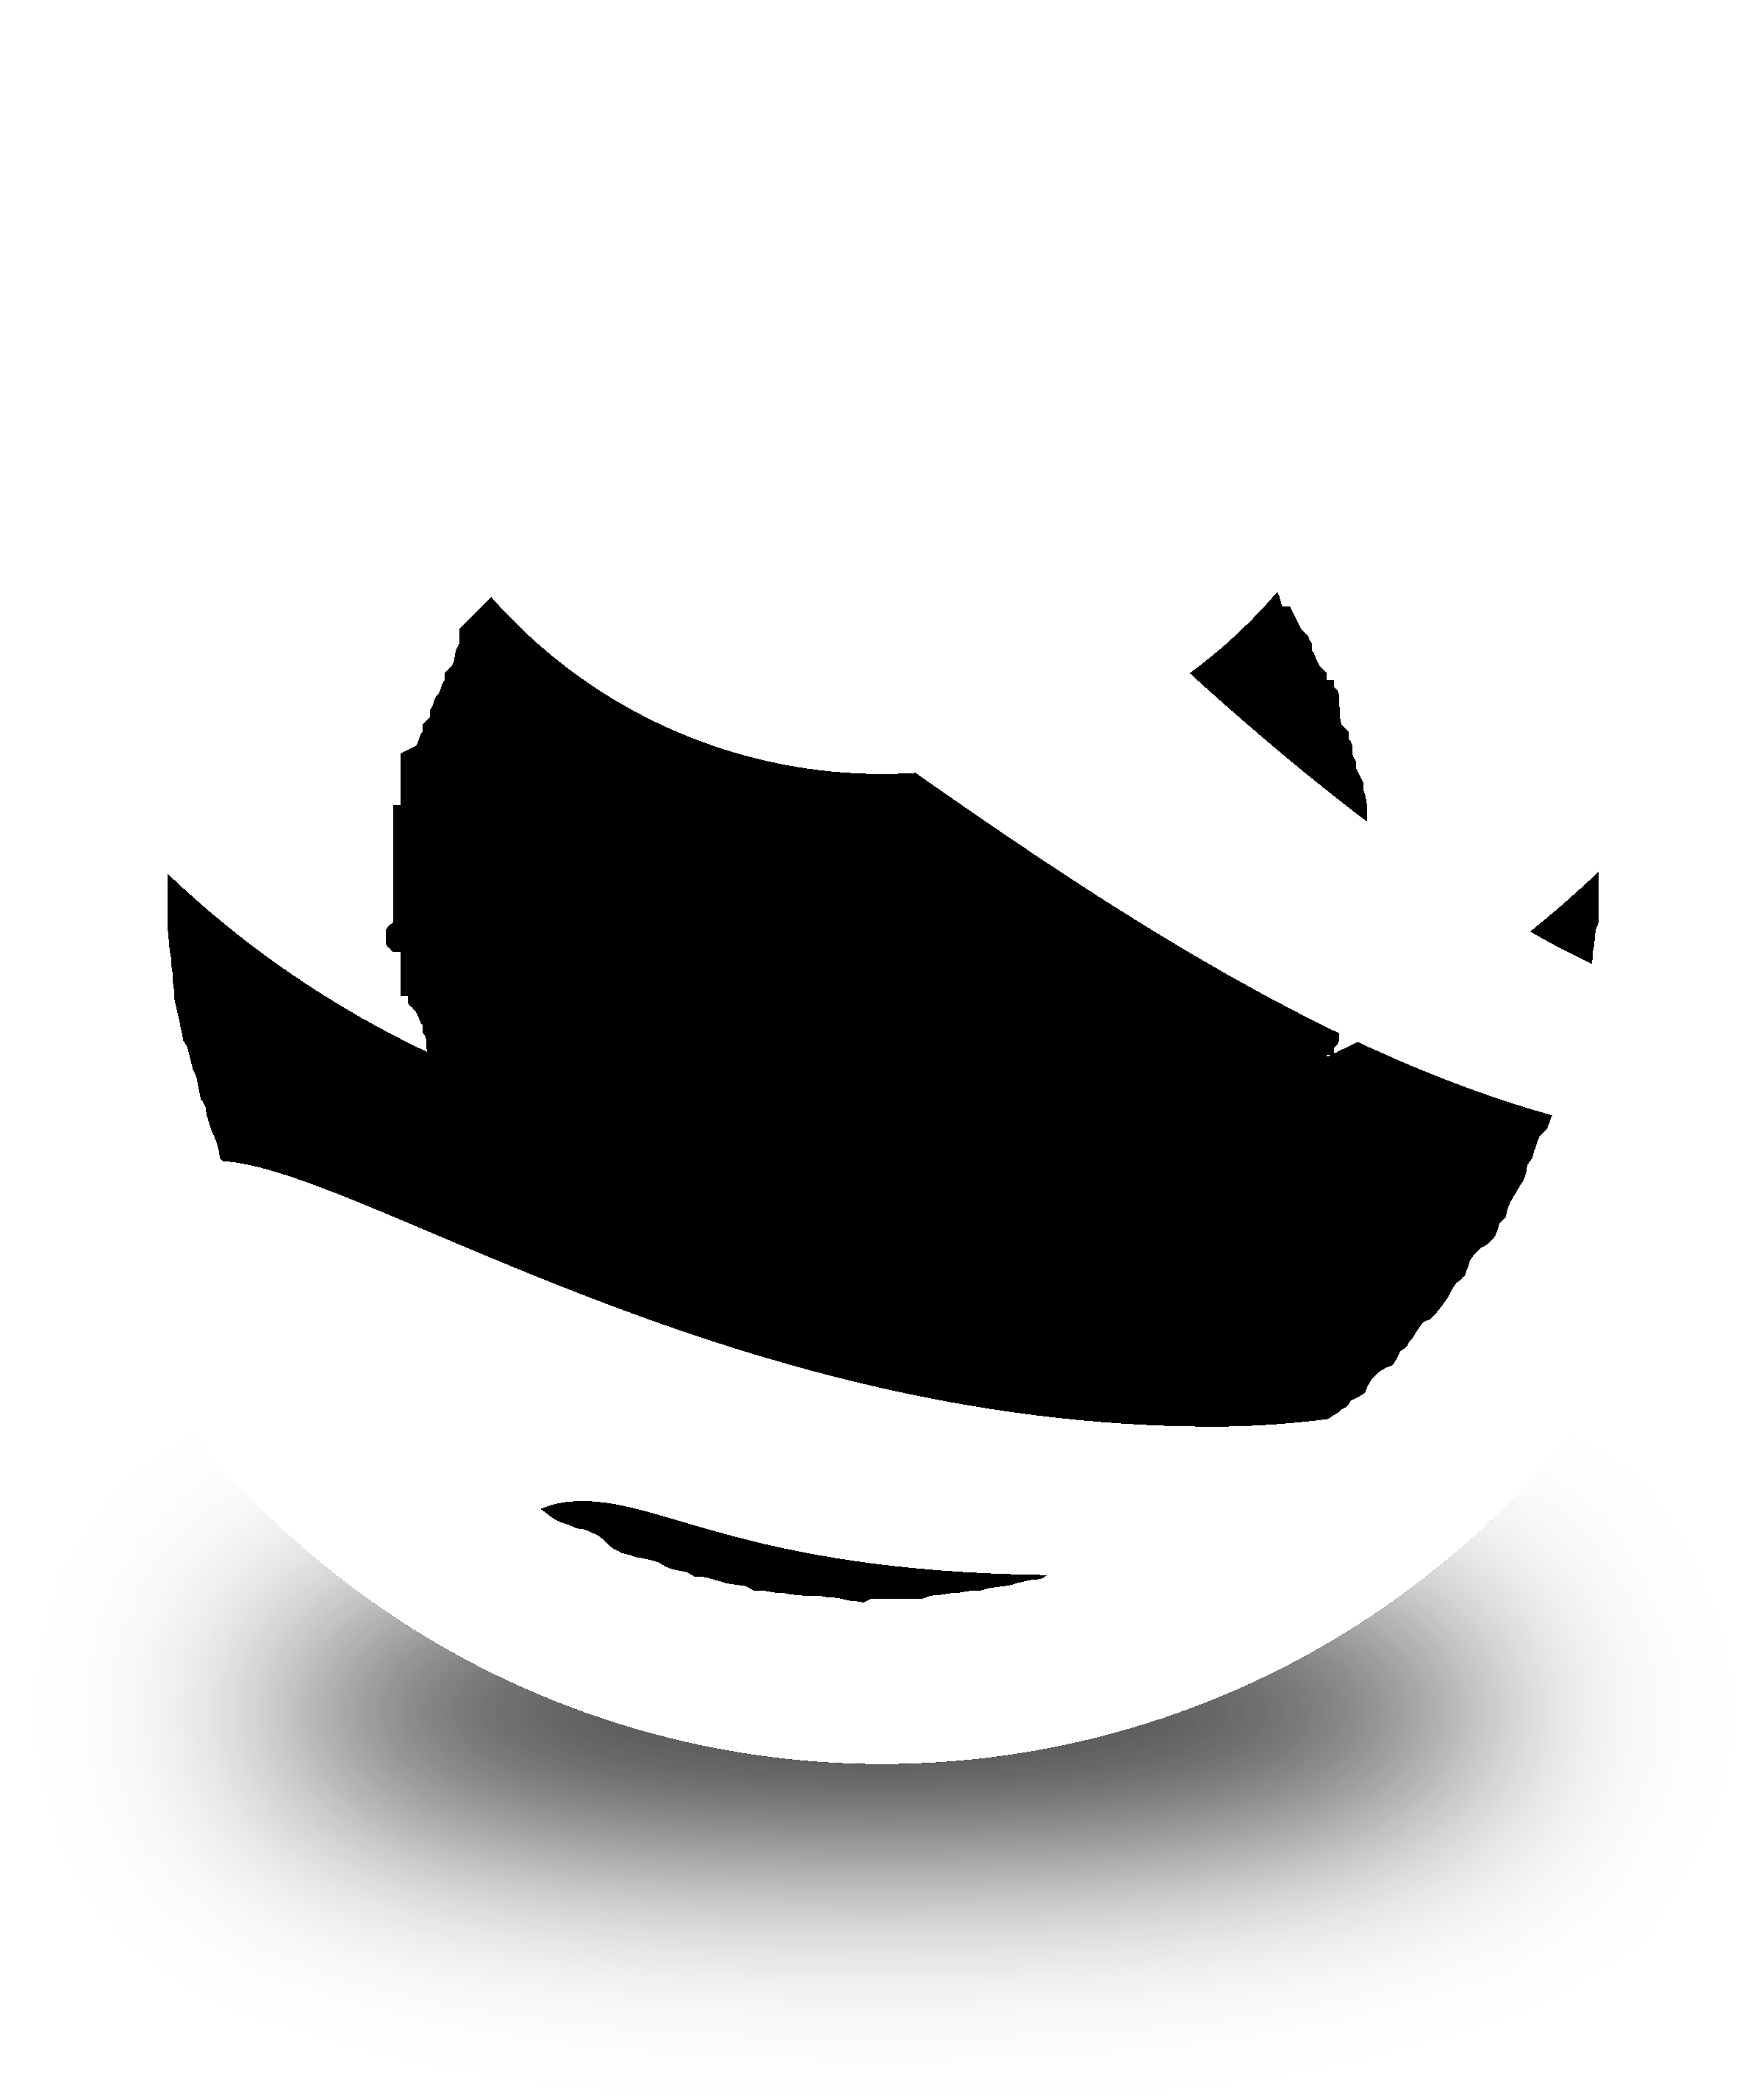 Black And White Google: Google Earth Logo PNG Transparent & SVG Vector